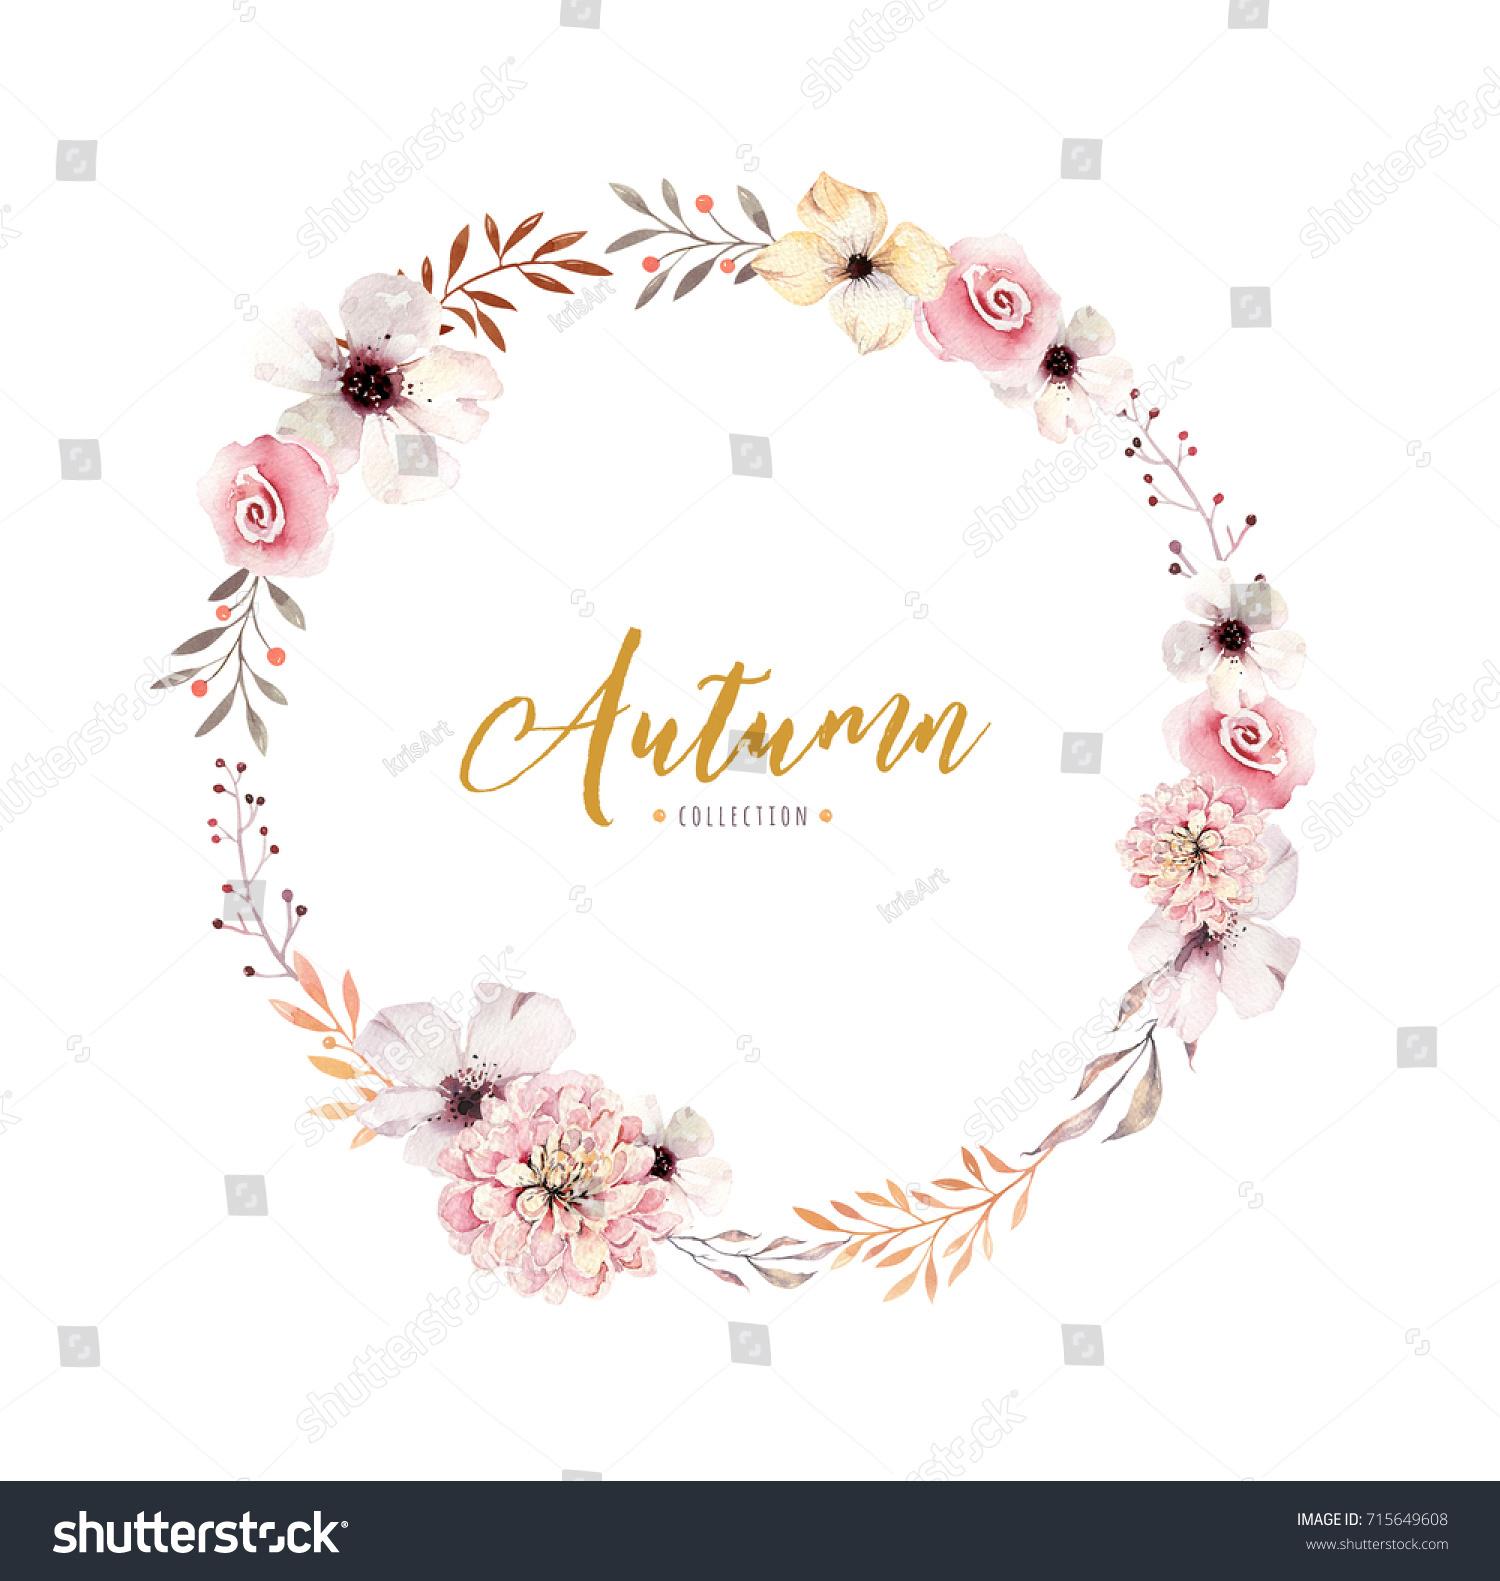 Watercolor Floral Boho Flower Wreath Watercolour Stock Illustration ...